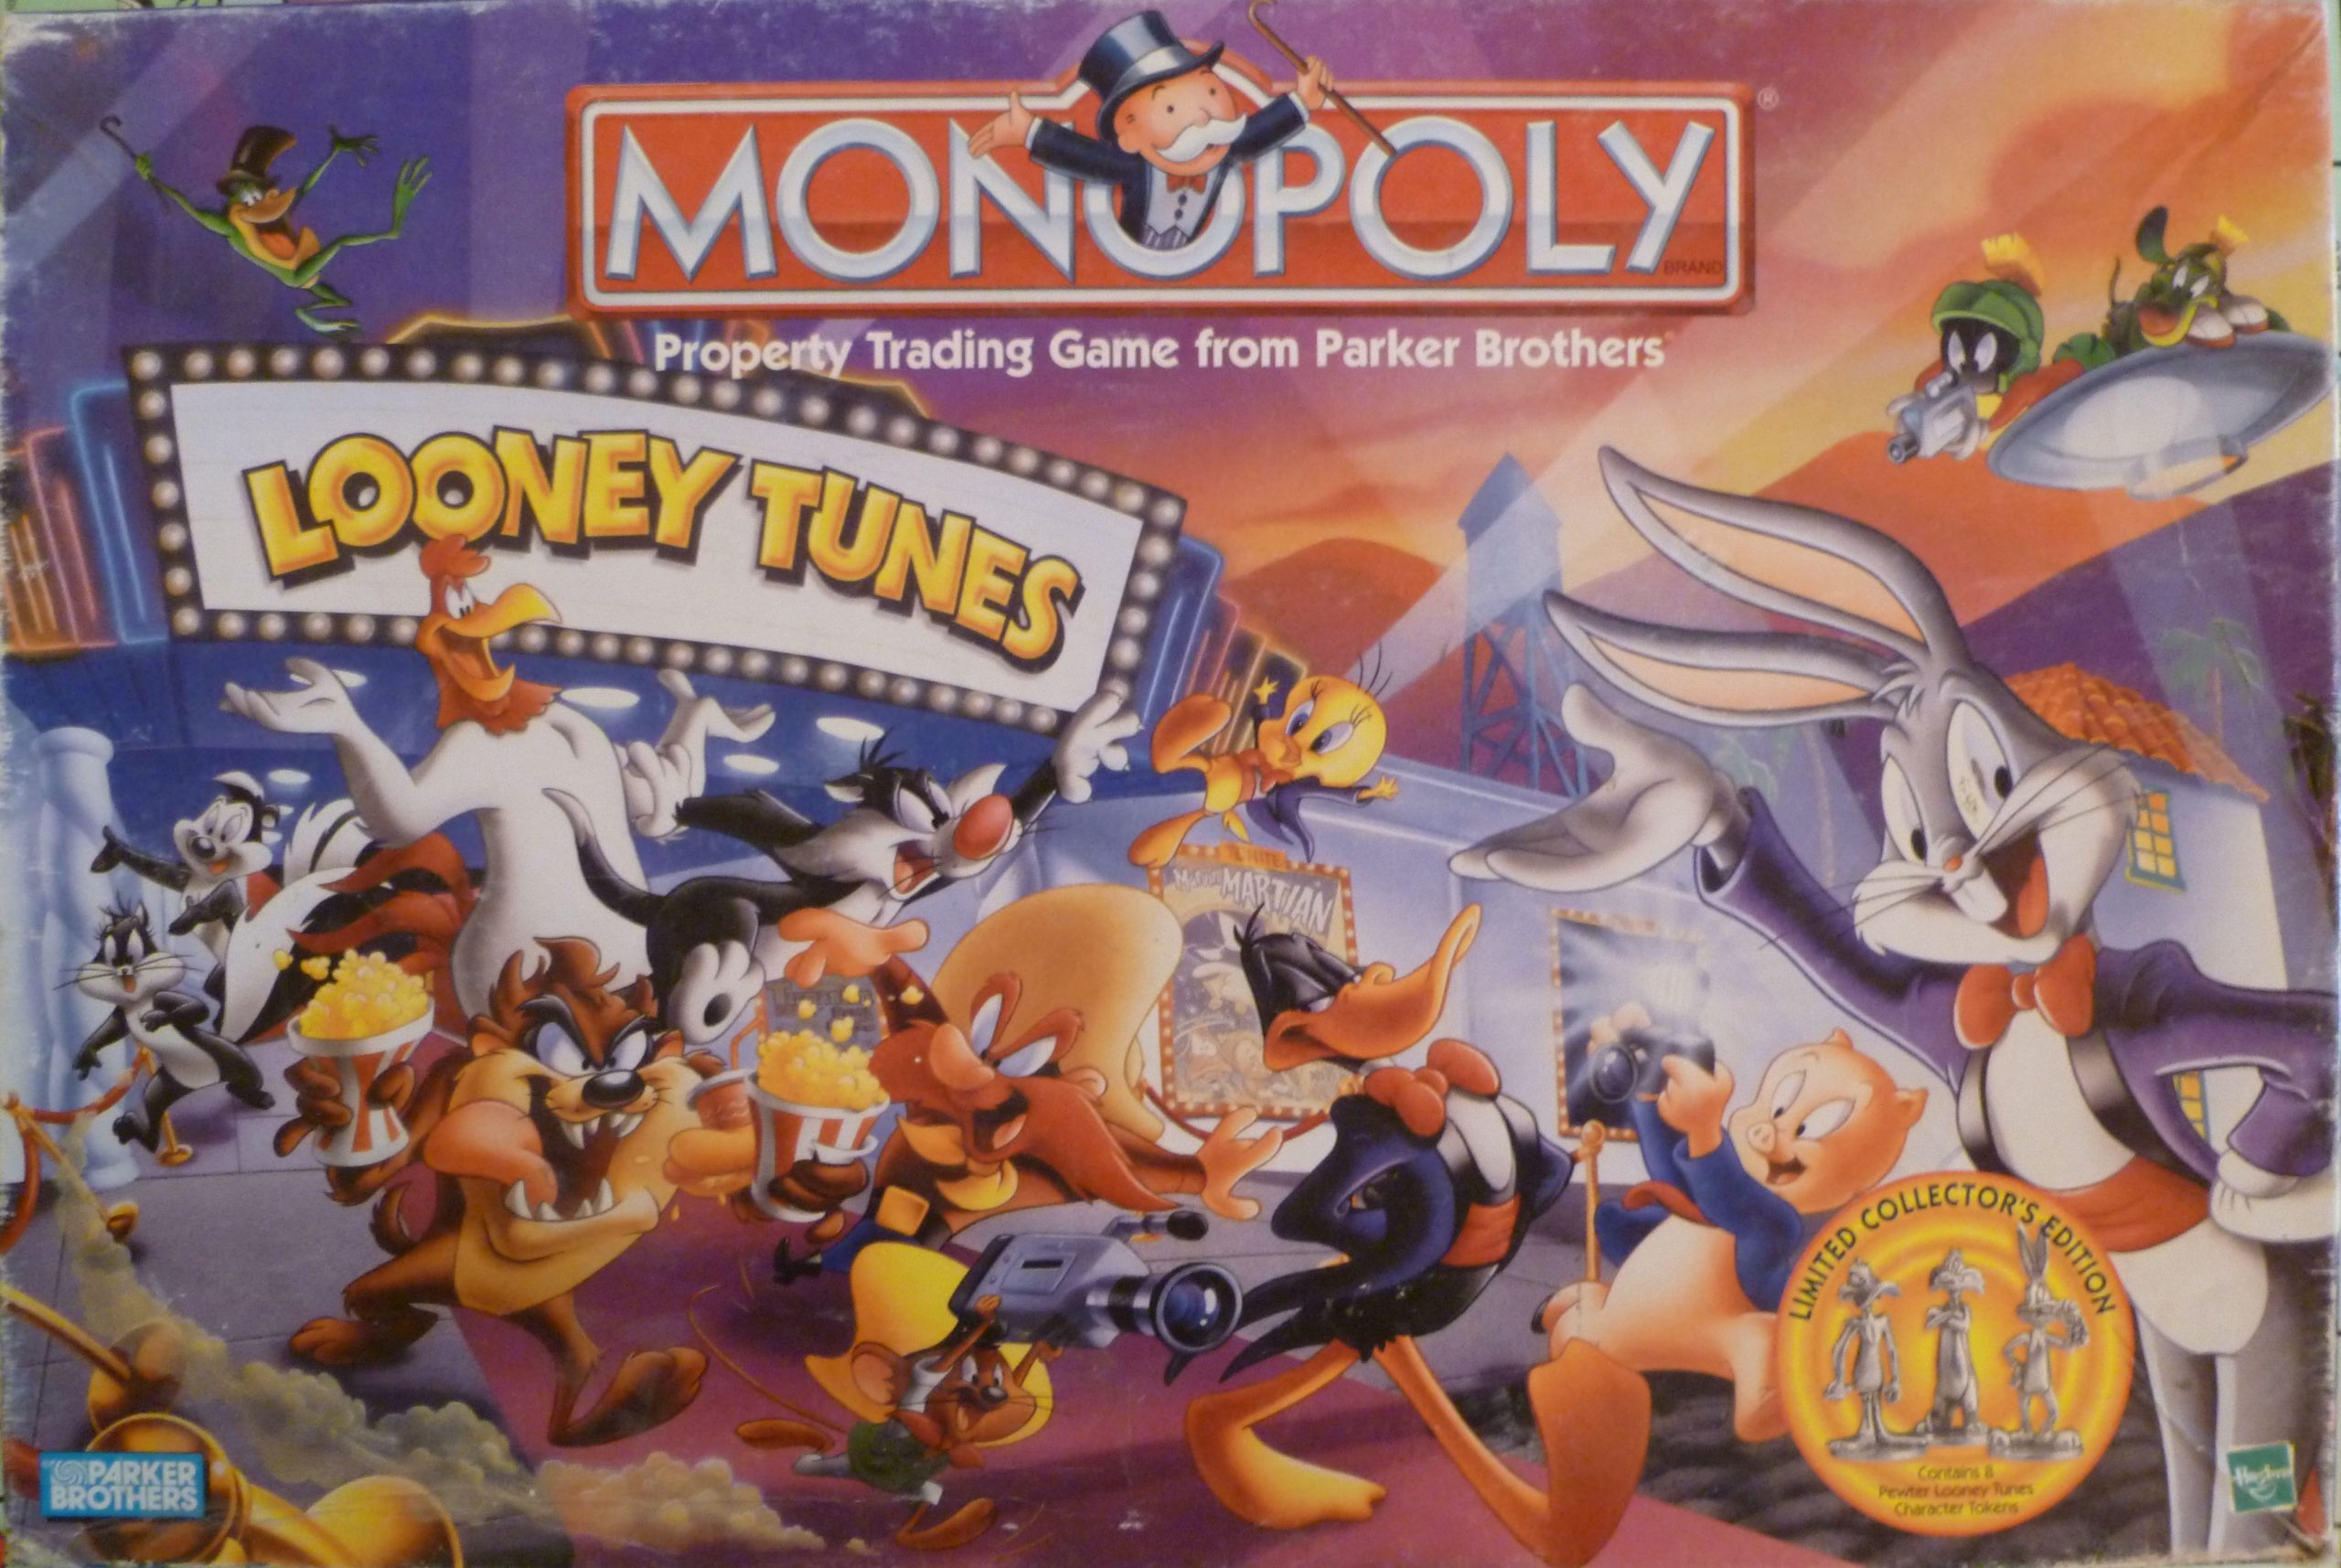 настольная игра Monopoly: Looney Tunes Монополия: Looney Tunes